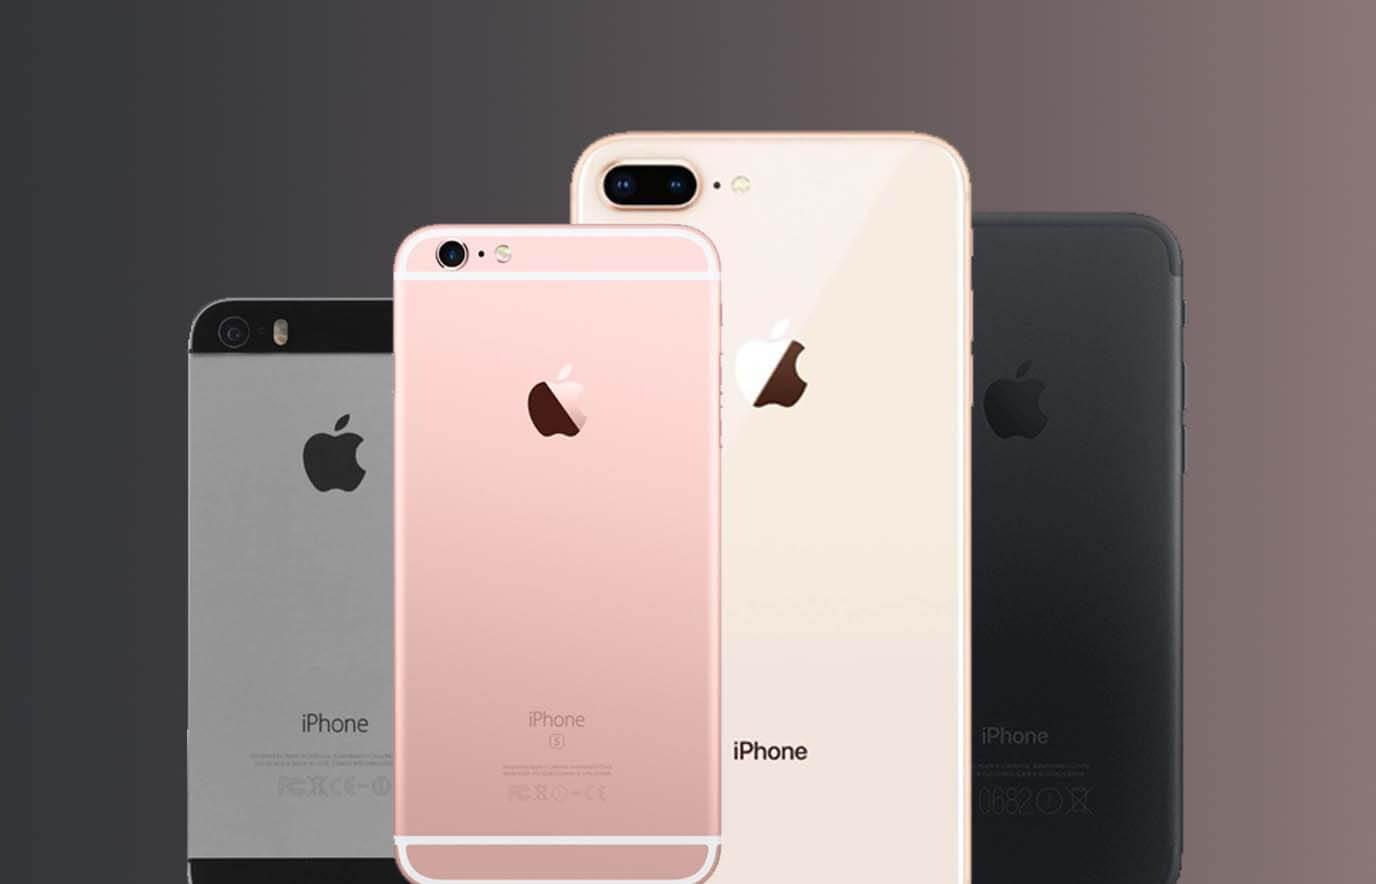 Hoelang ondersteunt Apple oudere iPhones nog?